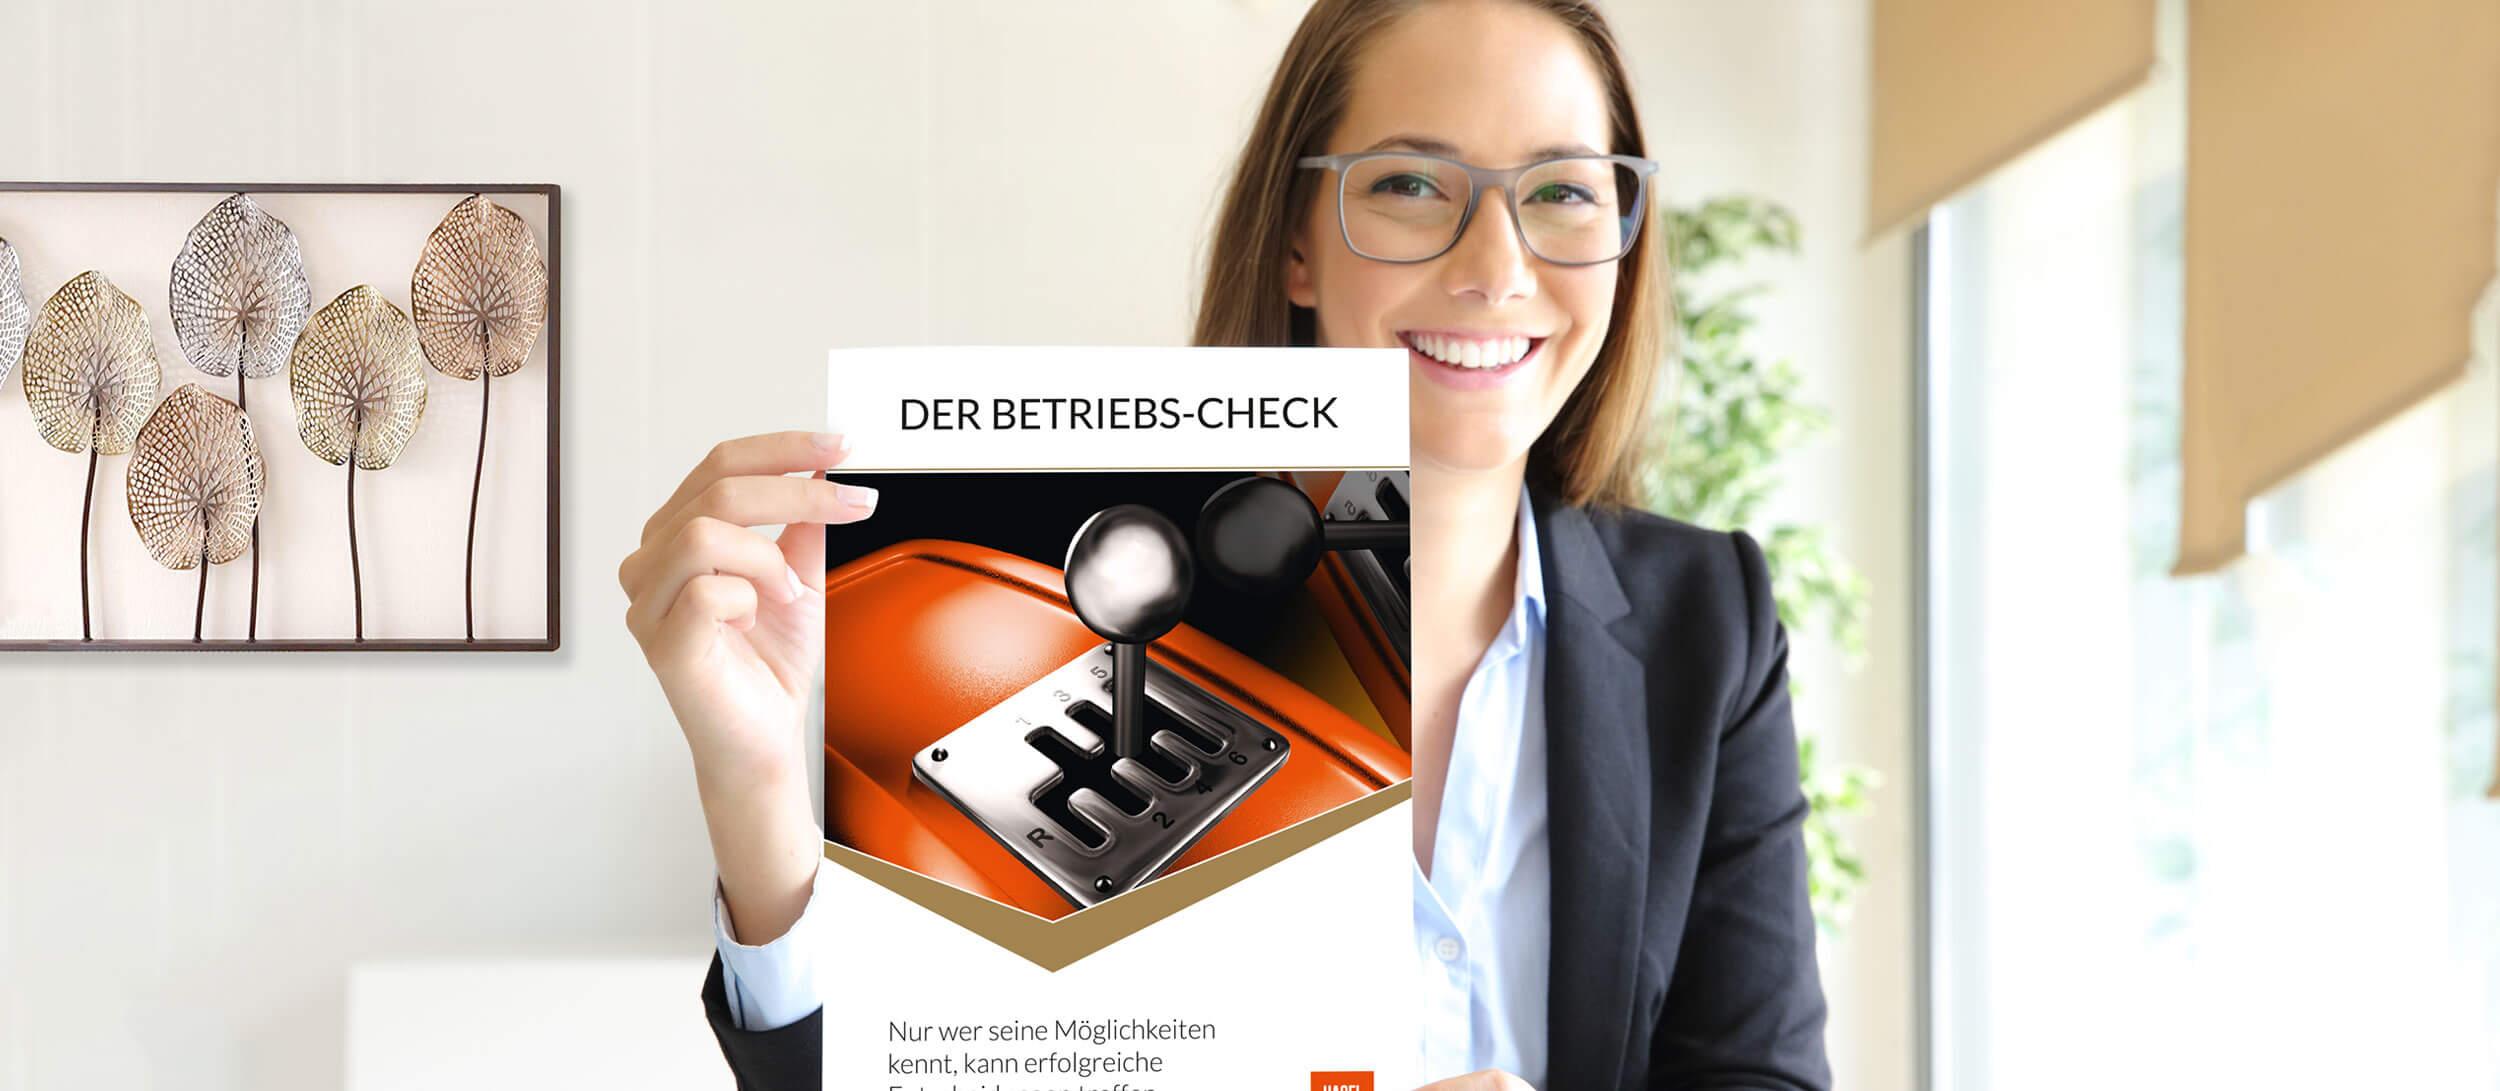 Haselböck Headerbild Betriebs-Check